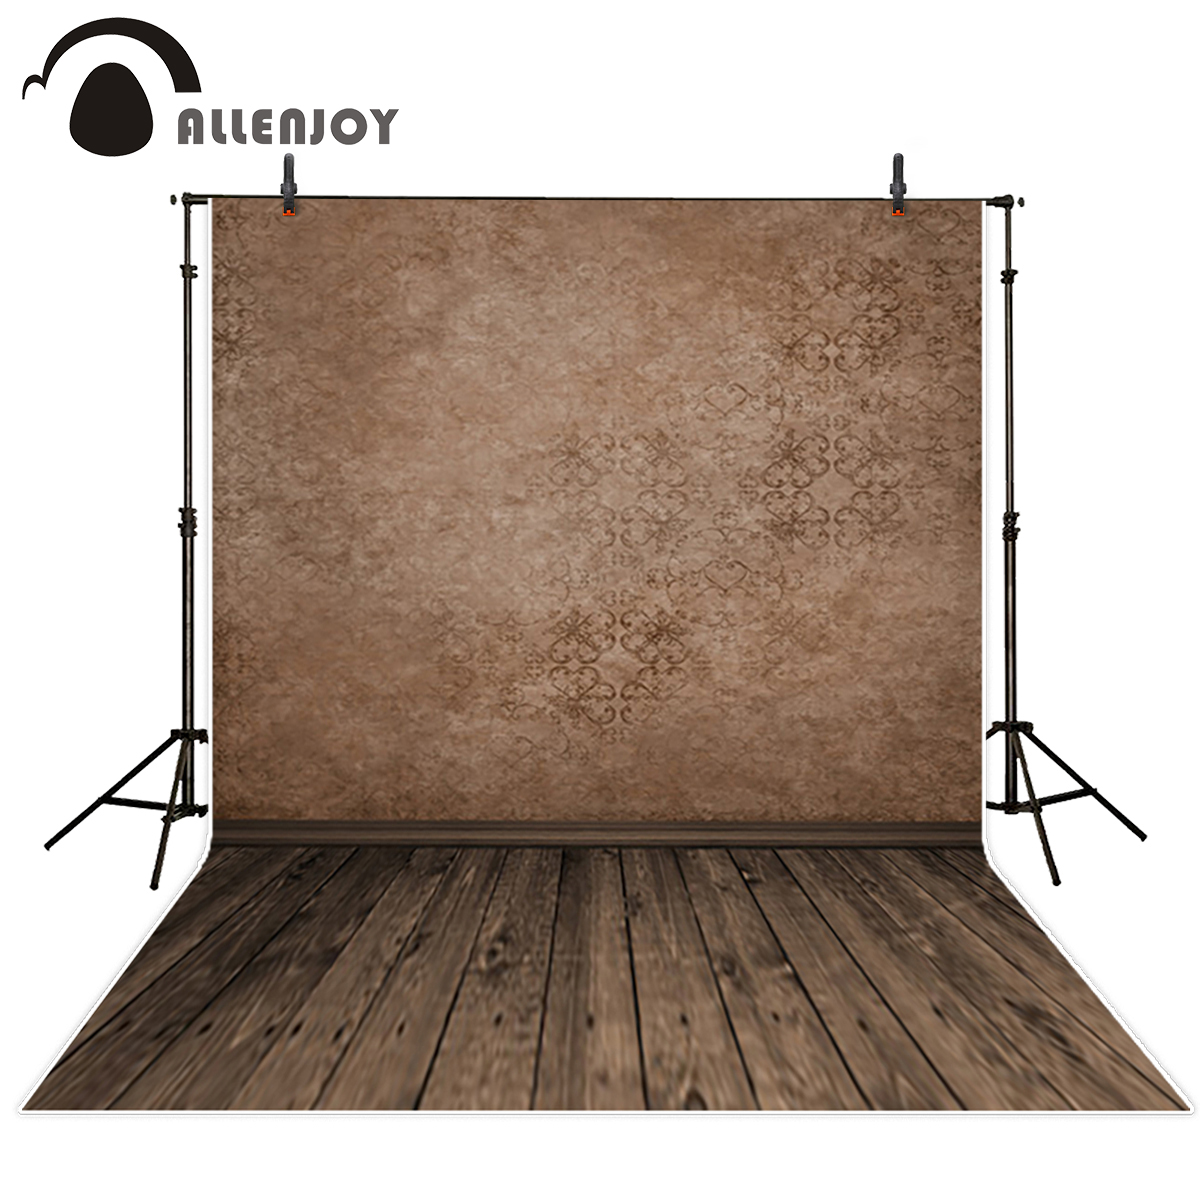 Allenjoy brown damask vintage wall wood floor photography backdrops plank newborn portrait wallpaper background photo studio